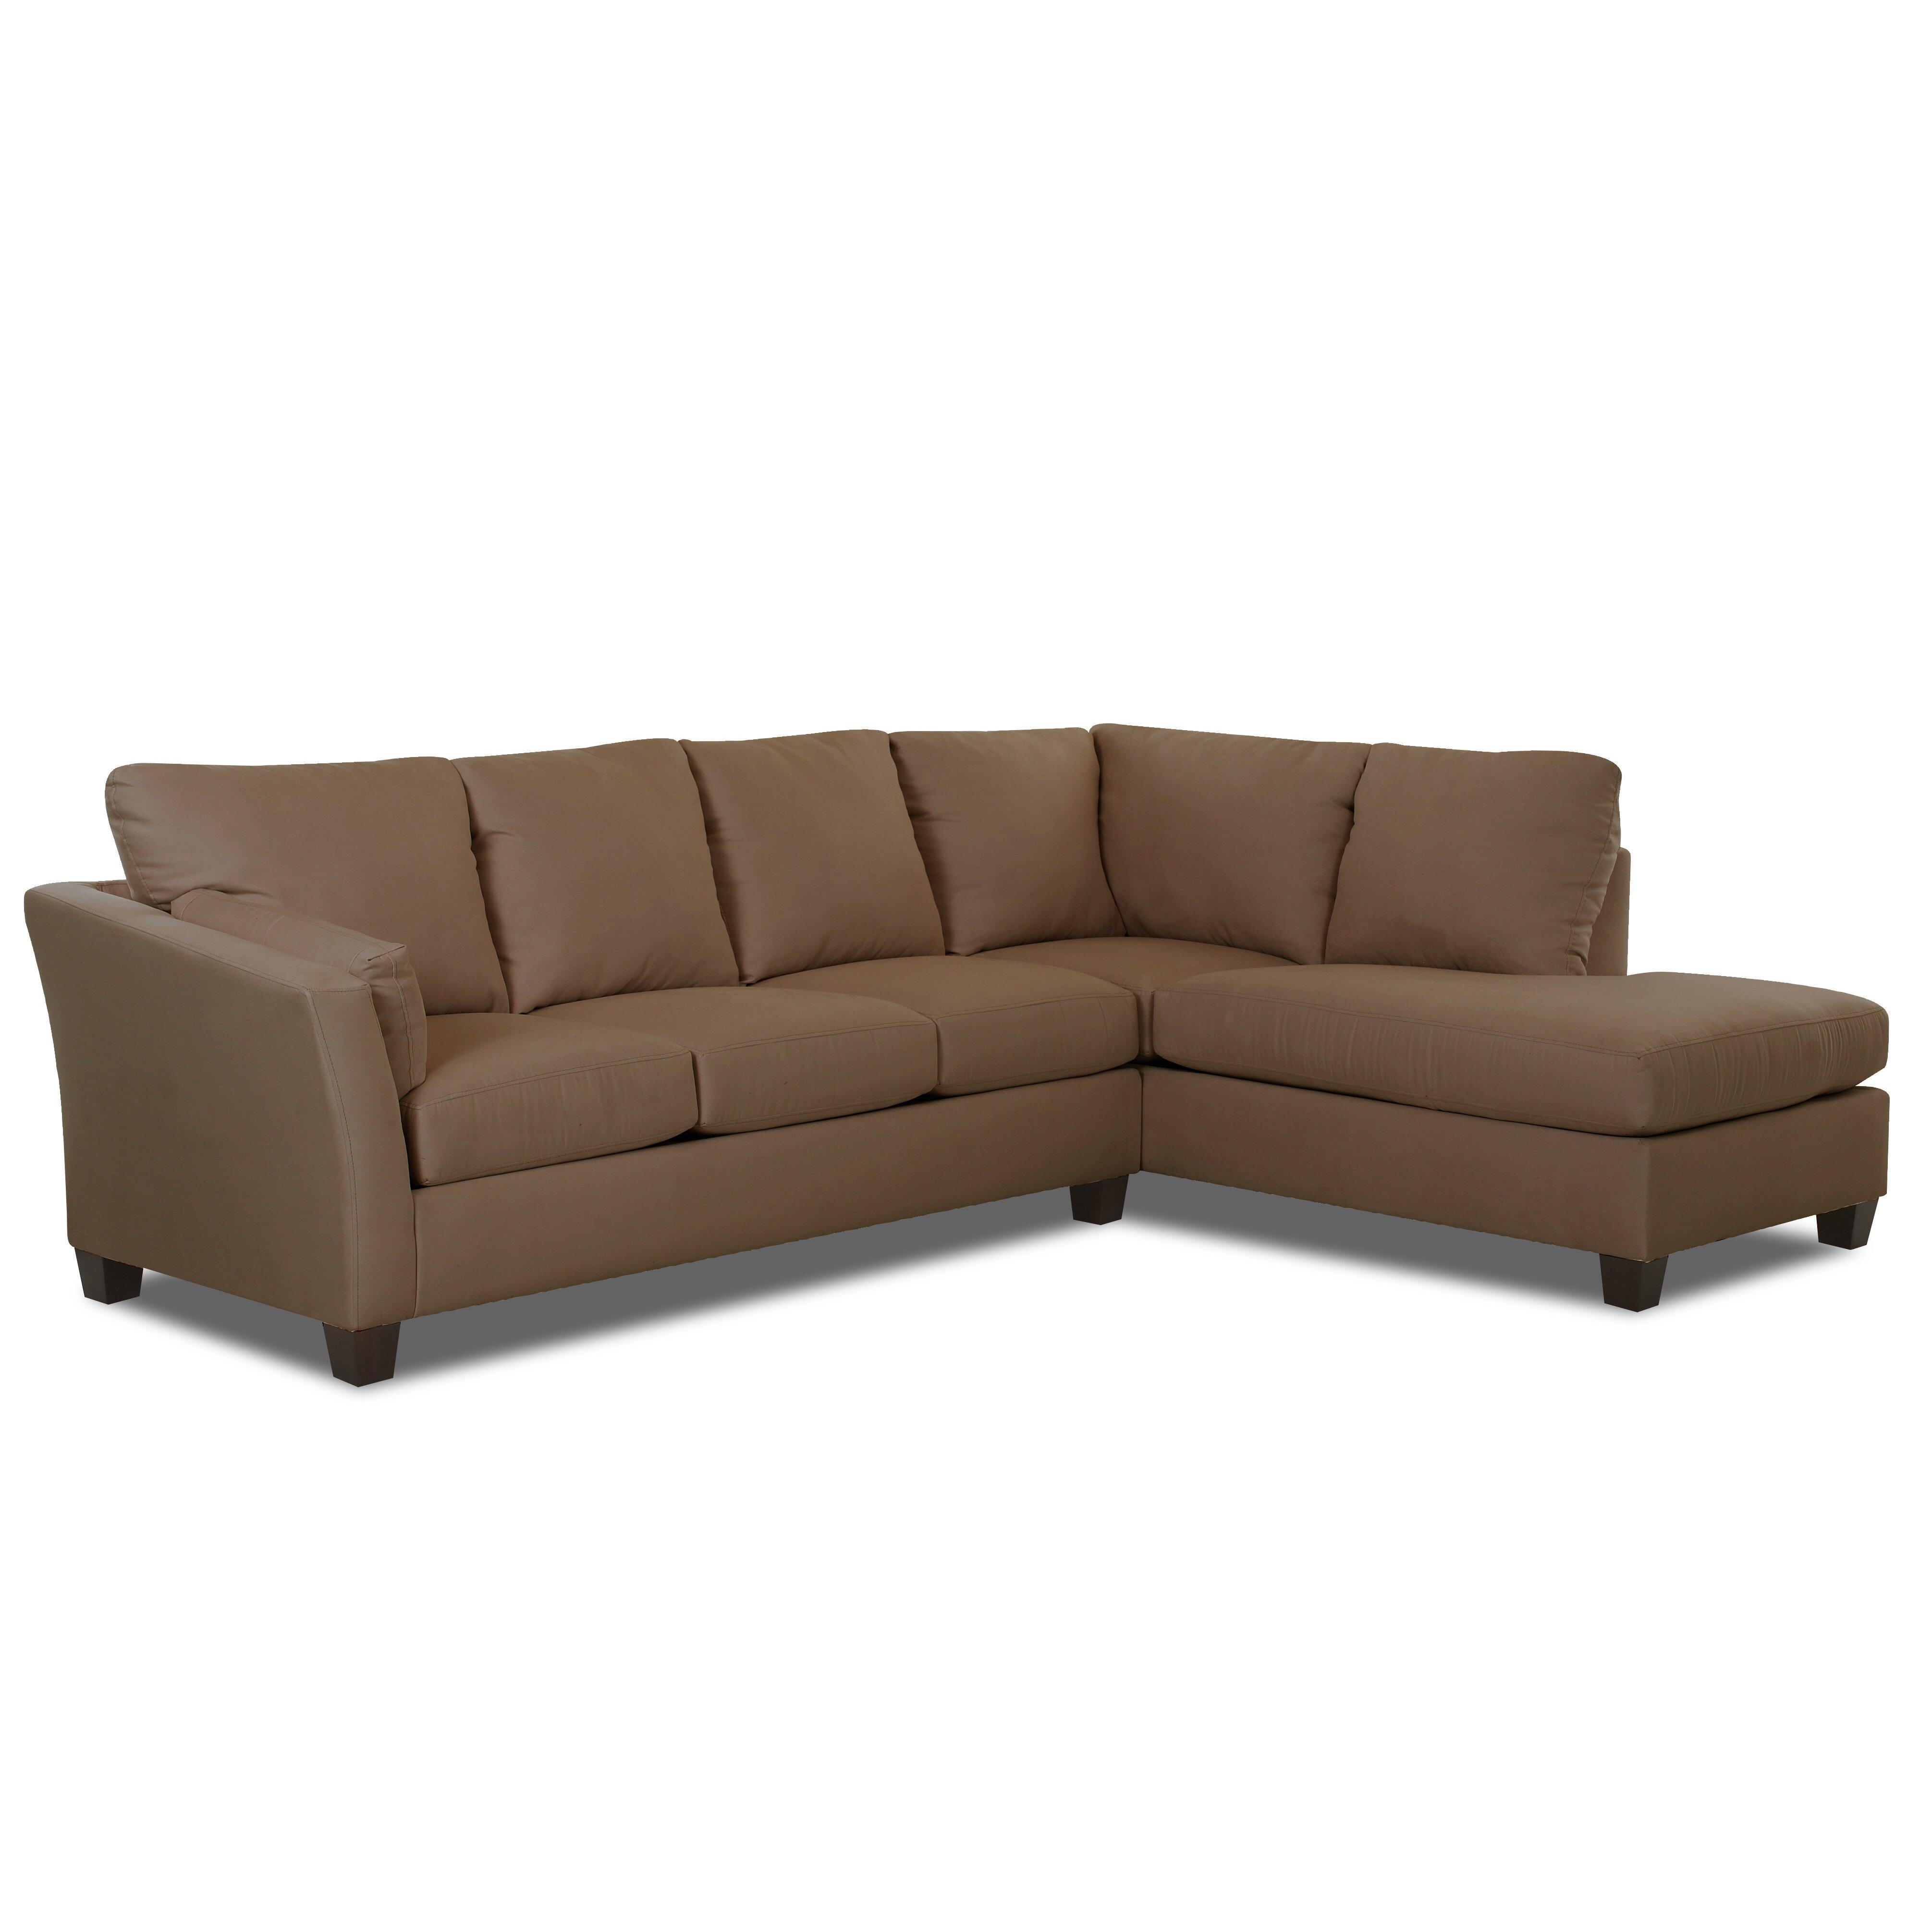 Klaussner Furniture Higgins Sectional & Reviews | Wayfair